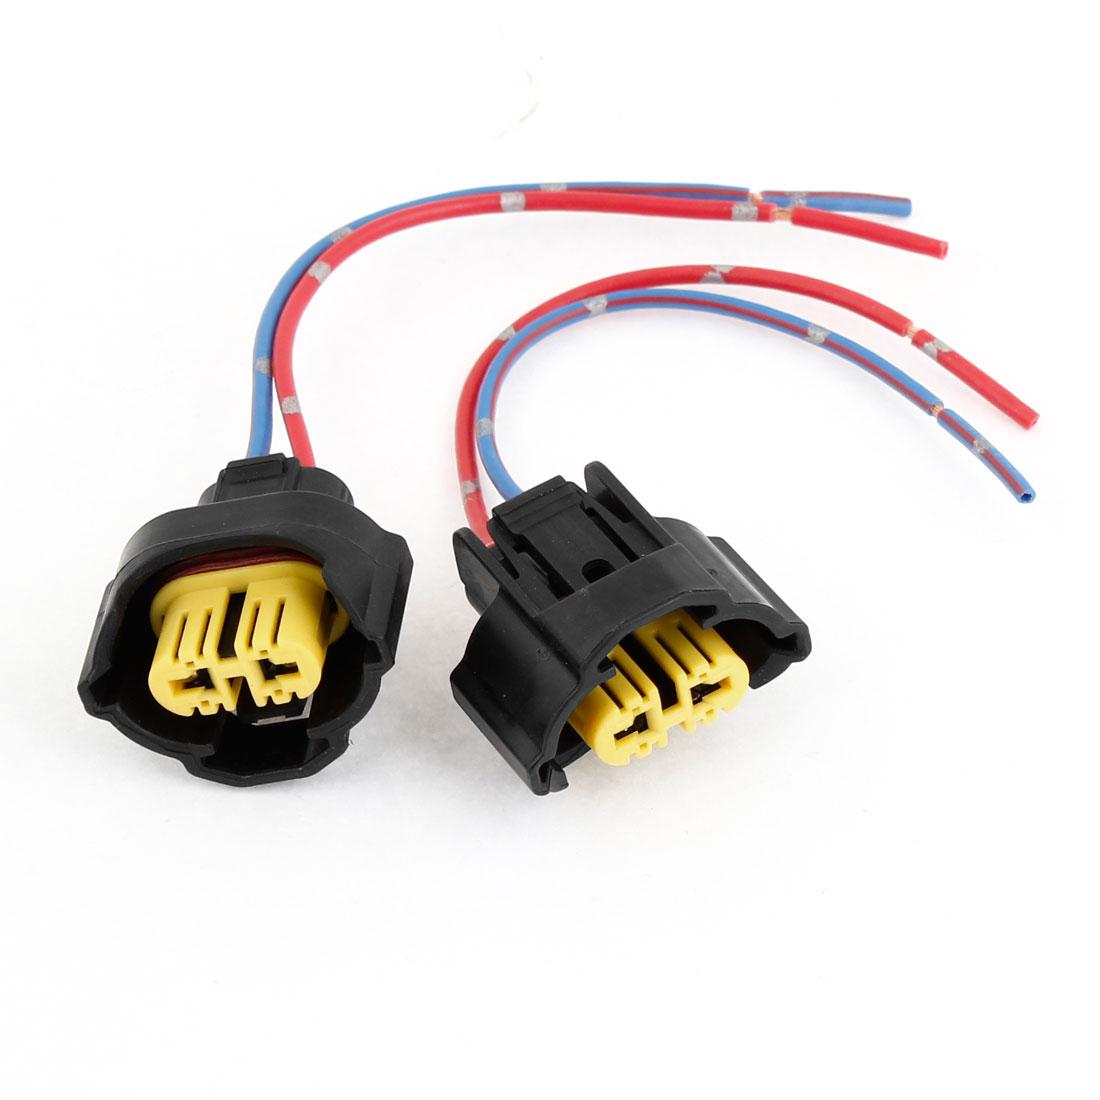 2 x H9 Plastic Fog Light Headlamp Pre-wired Socket for Car